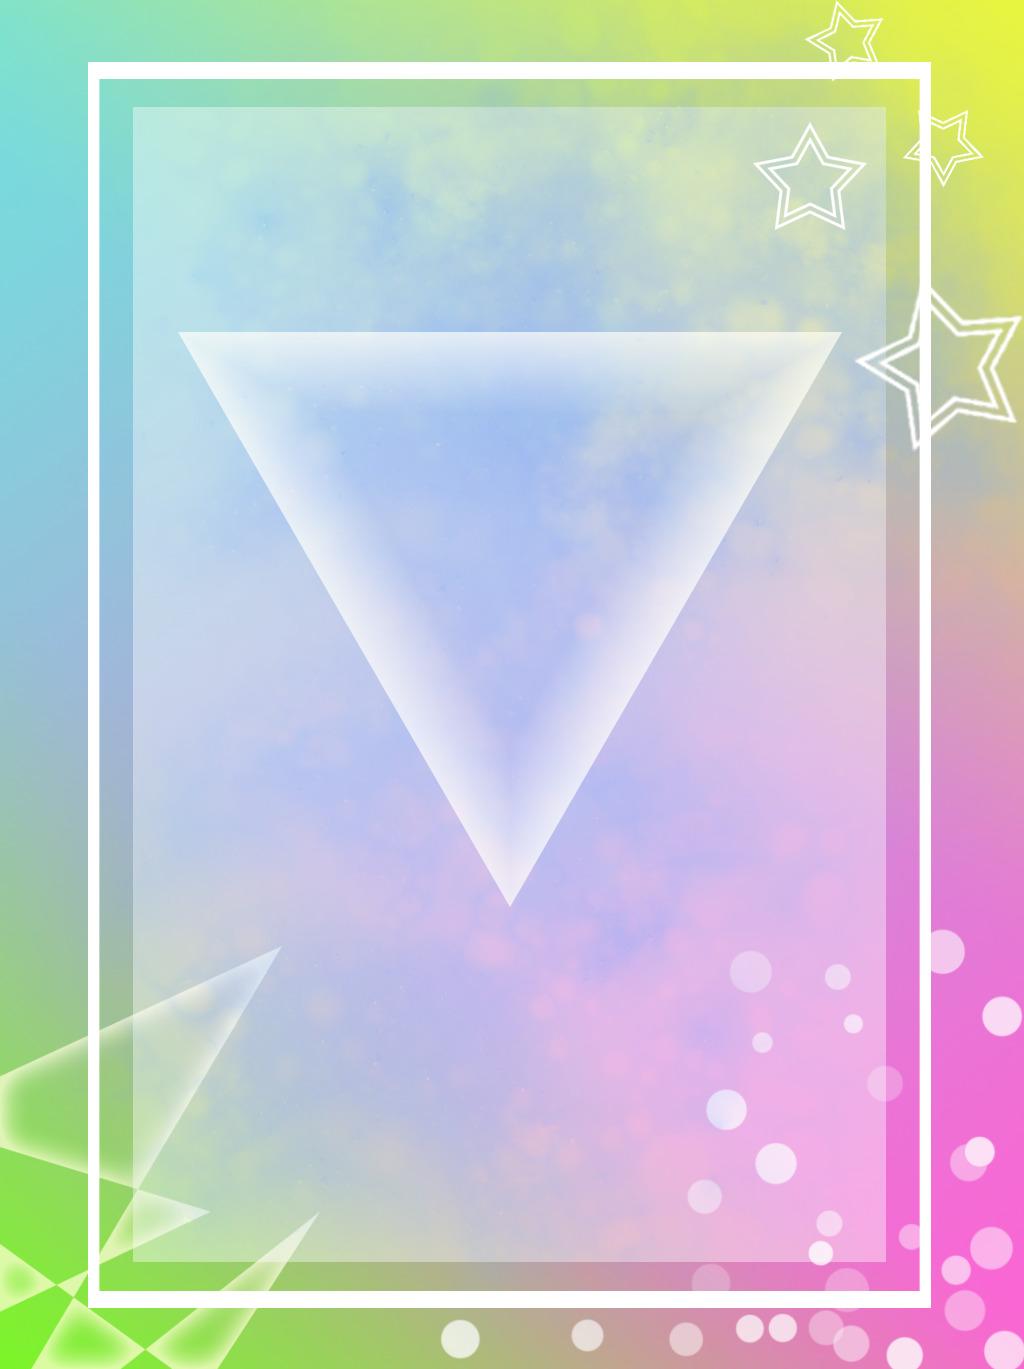 Freetoedit Star Circle Square Triangle Neon Geometri